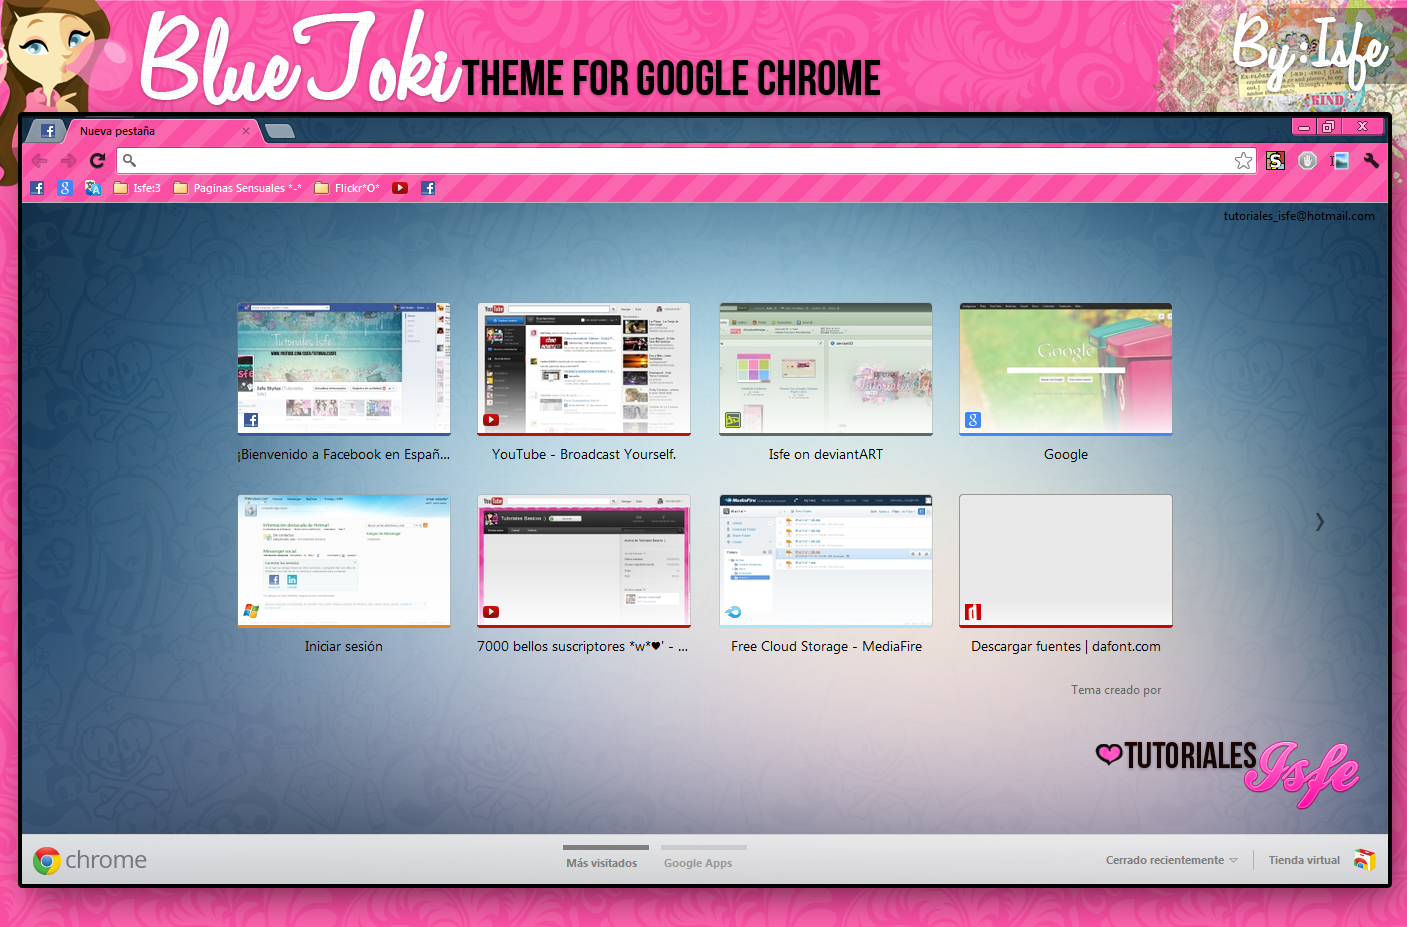 Theme for google chrome Blue toki by Isfe